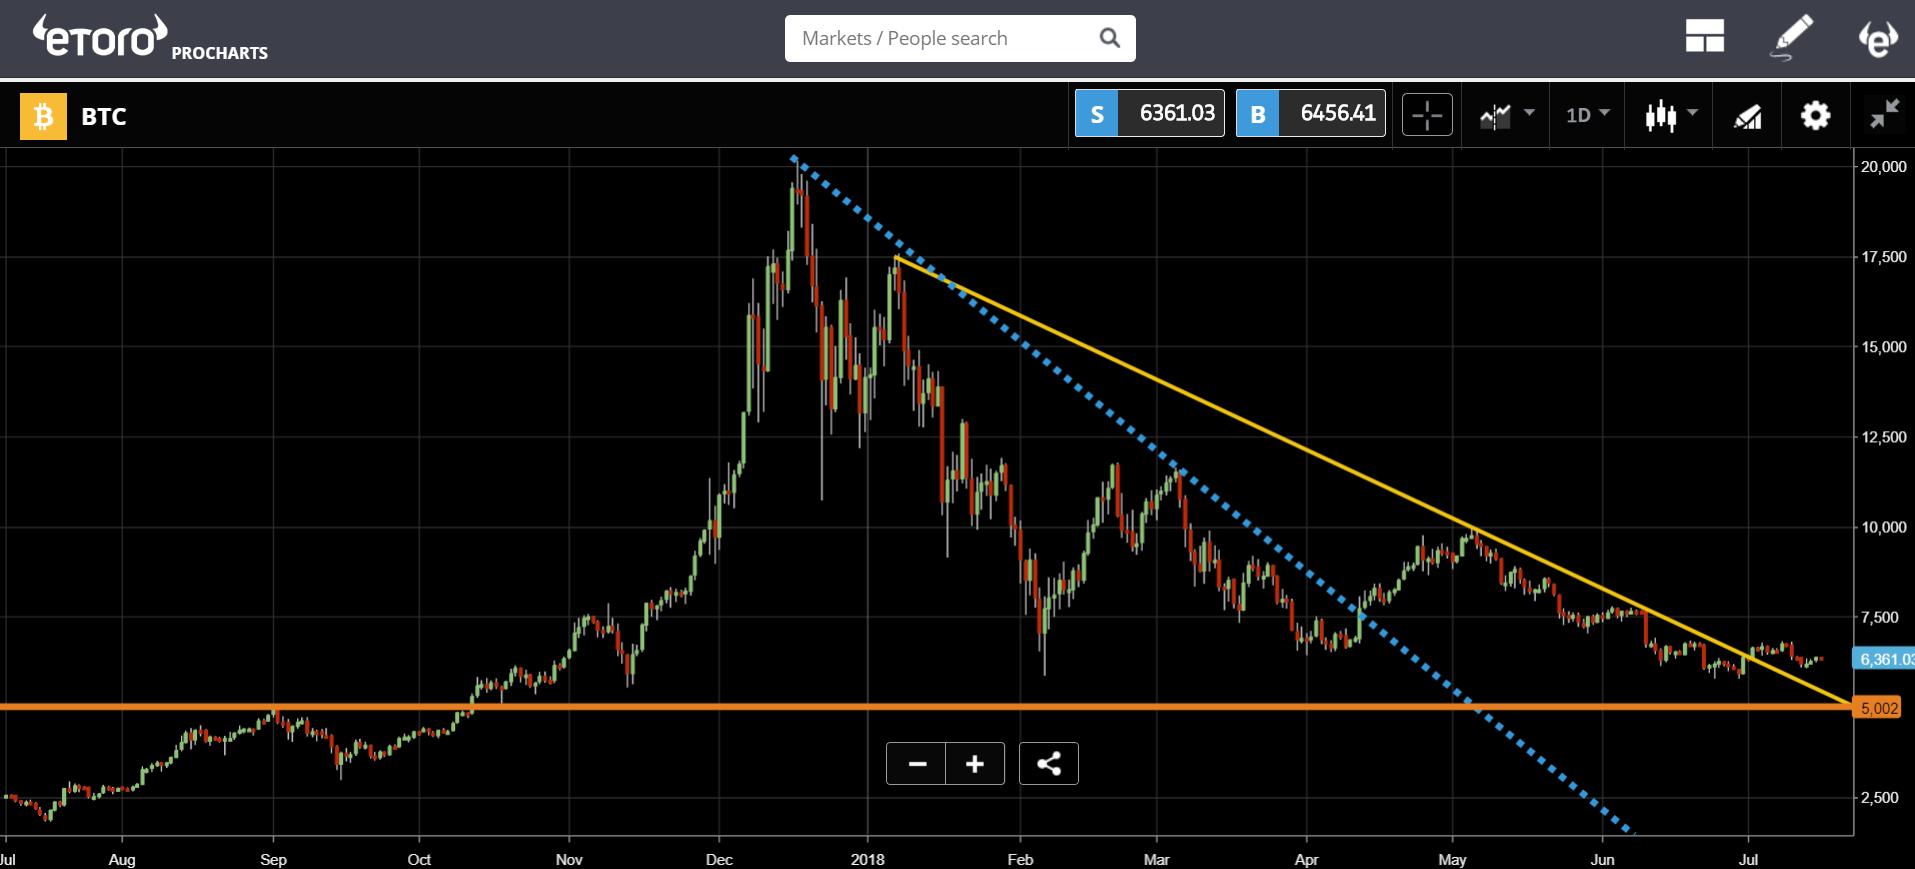 etoro, cryptocurrency, markets, trading, crypto, bitcoin, russia, trump, china, gdp